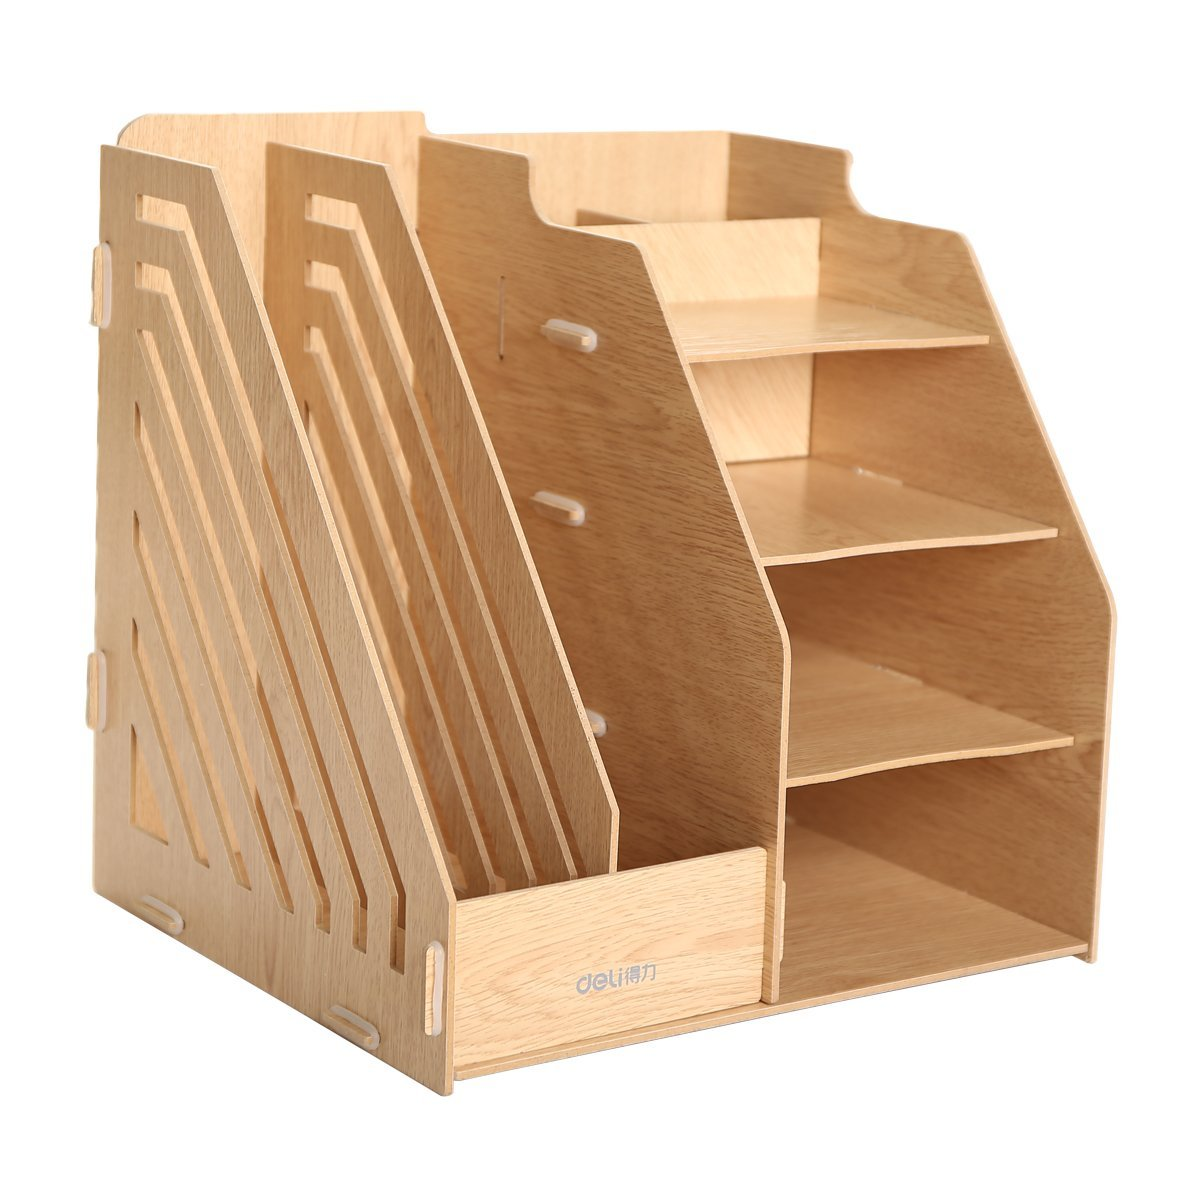 Hooshion® Detachable Desktop Storage Box Wooden Board DIY Organizer Shelf Office Supplies Storage Boxes Paper Files Slot / Magazine Holder and 4 Compartments Bins- DIY